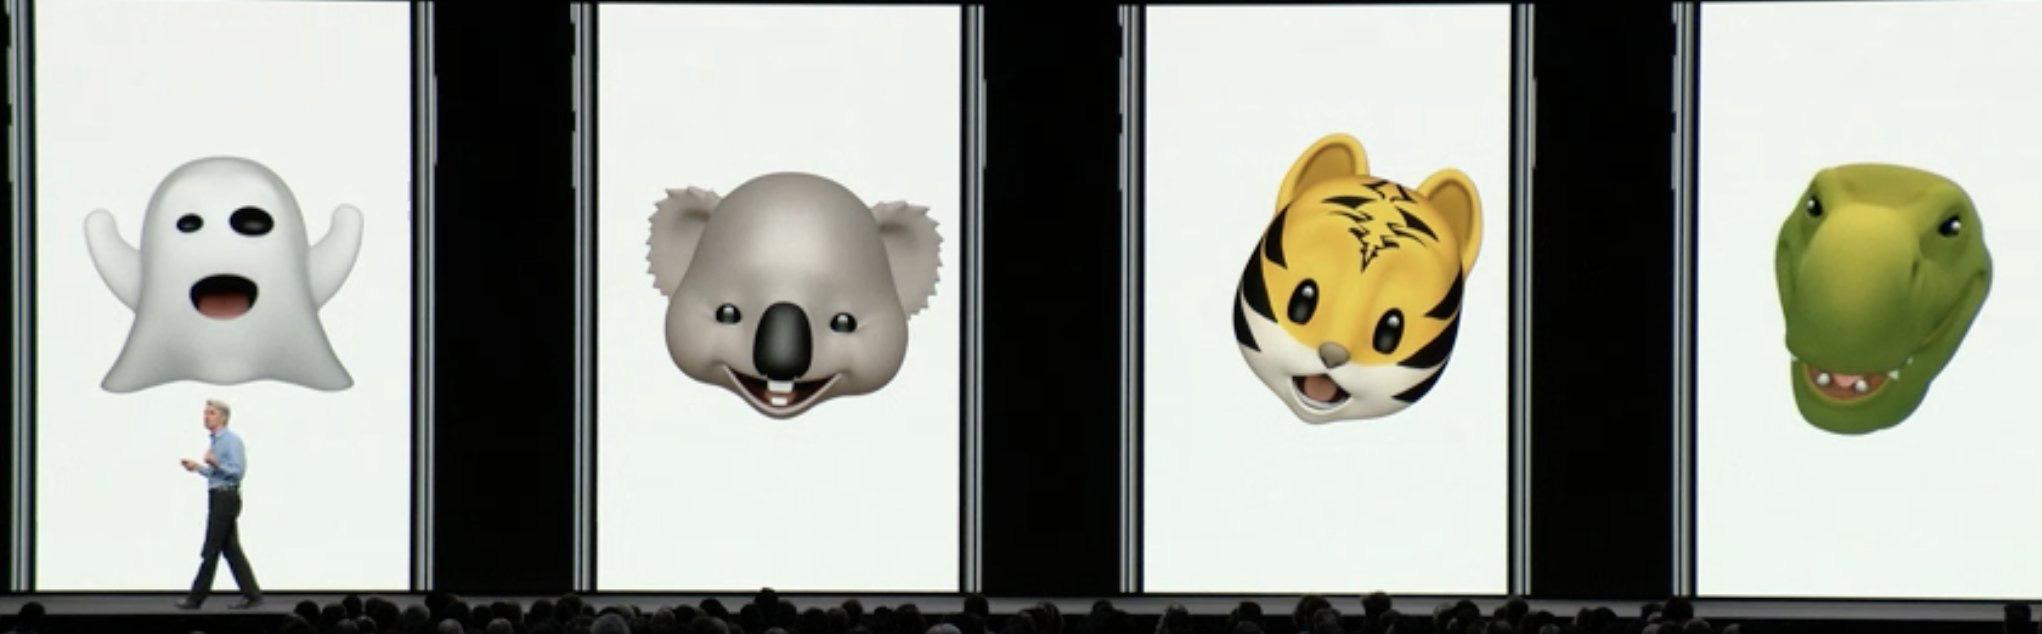 Nuevos Animojis de iOS 12